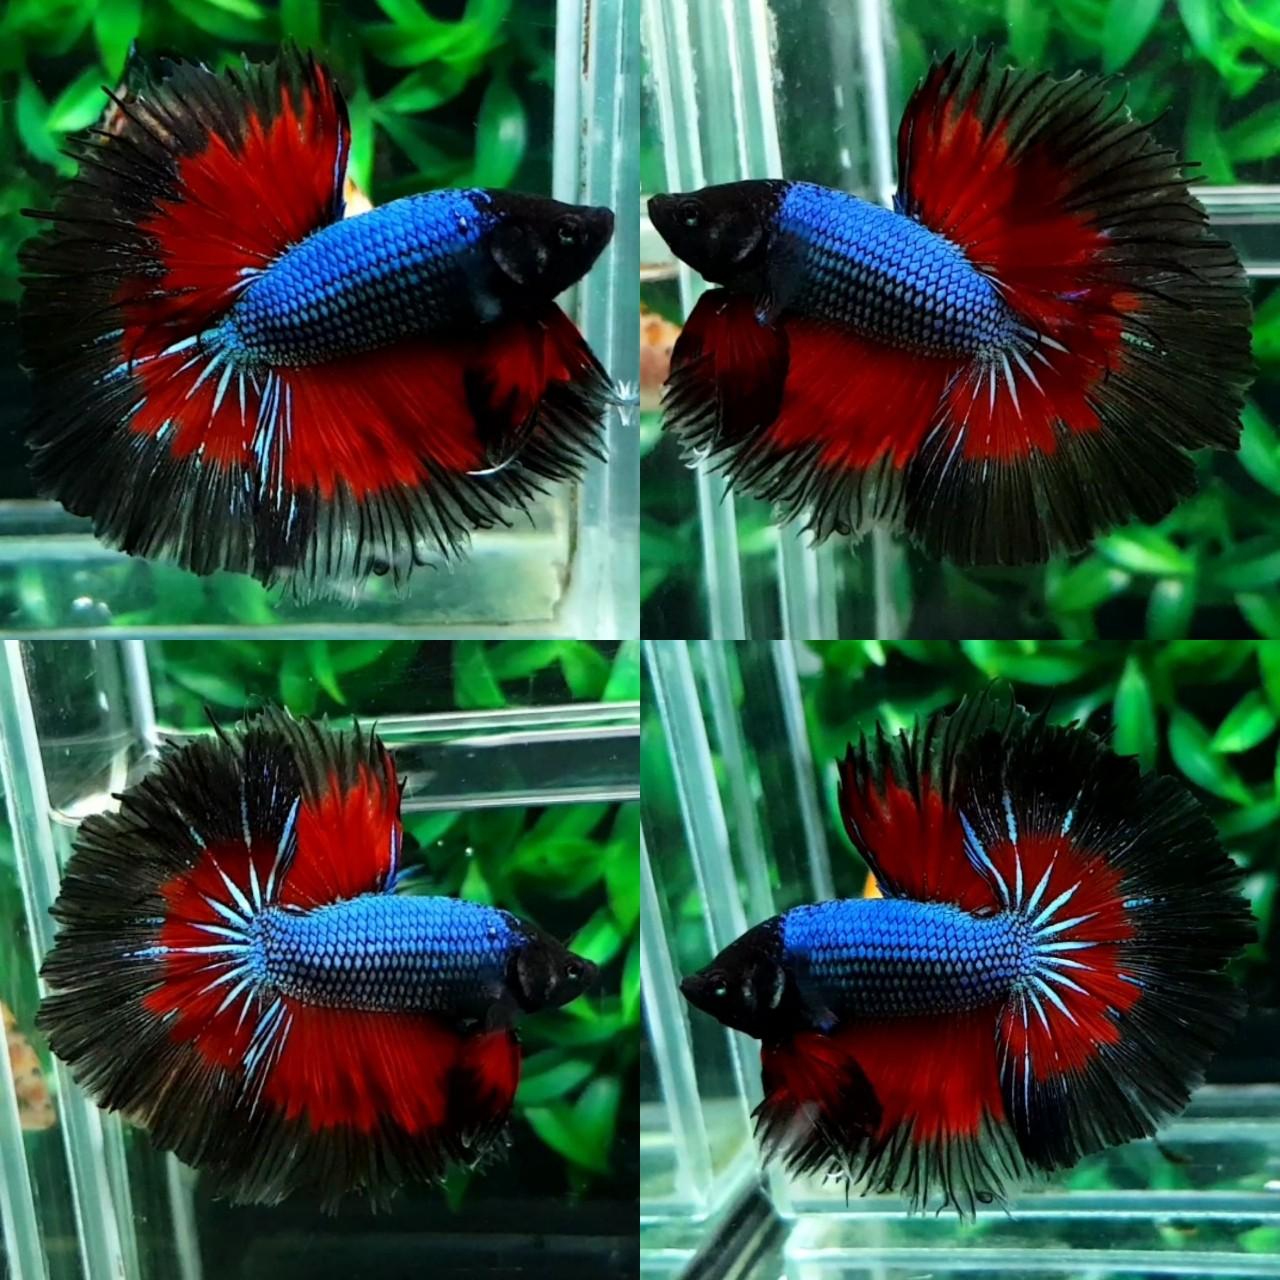 fwbettashm3102152033 - OHM male Blue Red Black Marble By Kingpetall